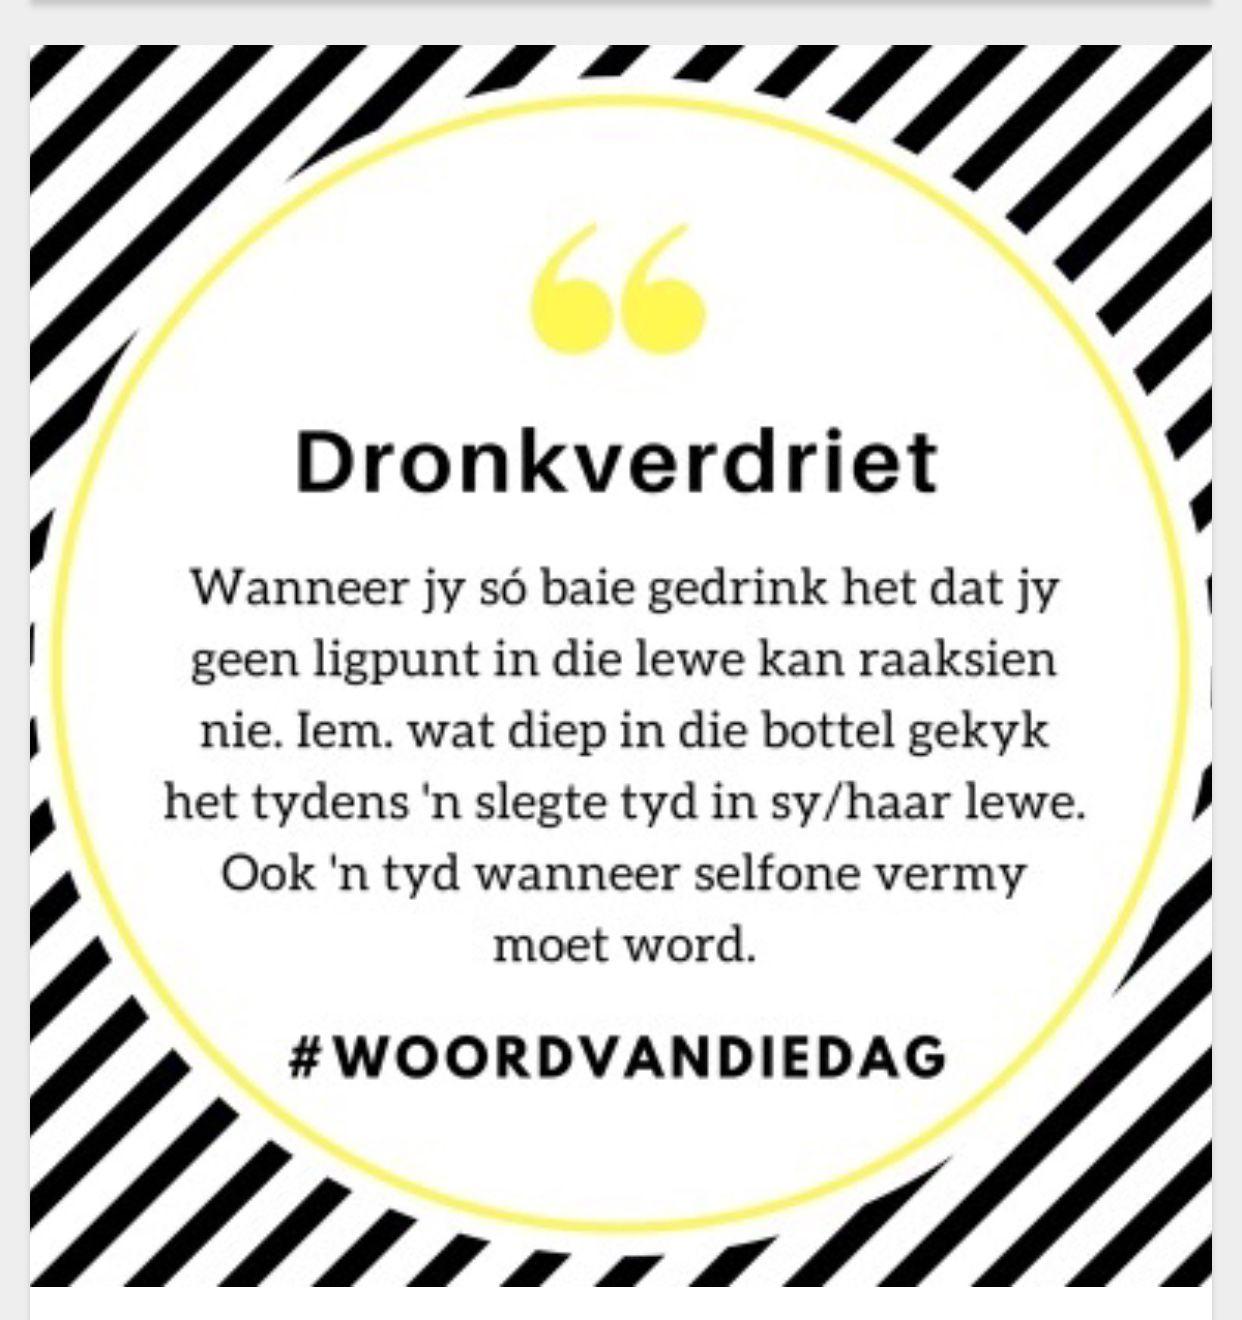 Dronkverdriet Afrikaanse Quotes Afrikaans Quotes Afrikaans